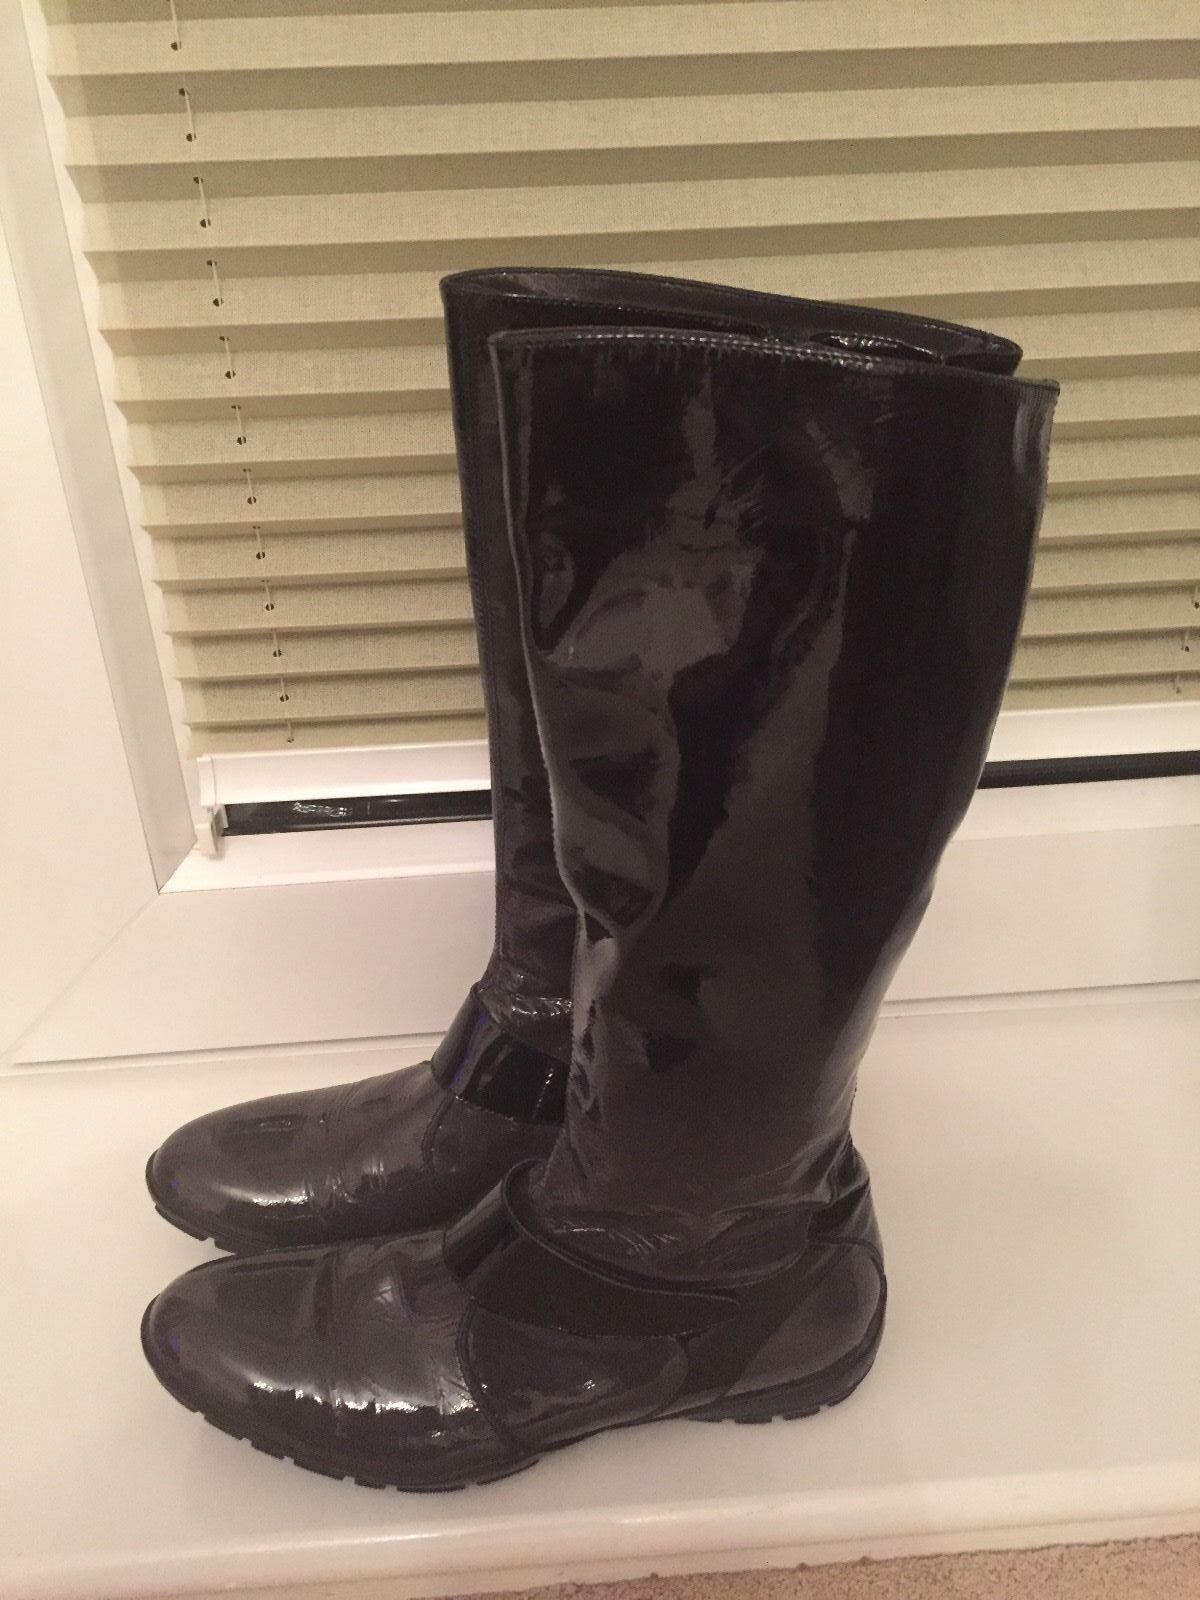 Baldinini Italian boots, schuhe patent Leder Größe 38,very soft 5UK schwarz,Grau